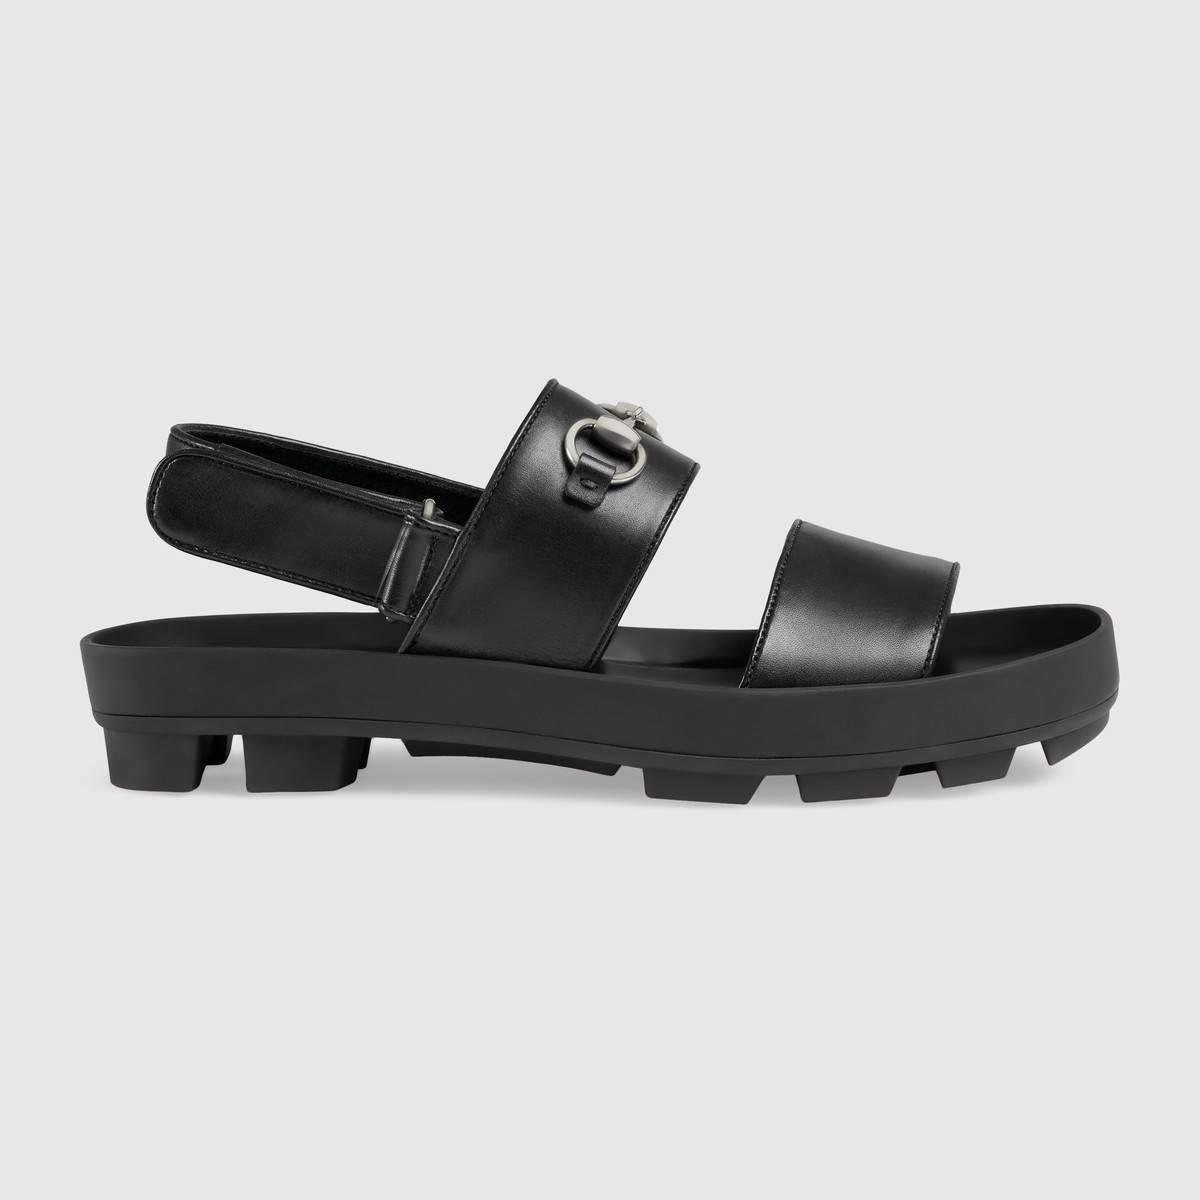 Gucci Black Leather Sandal